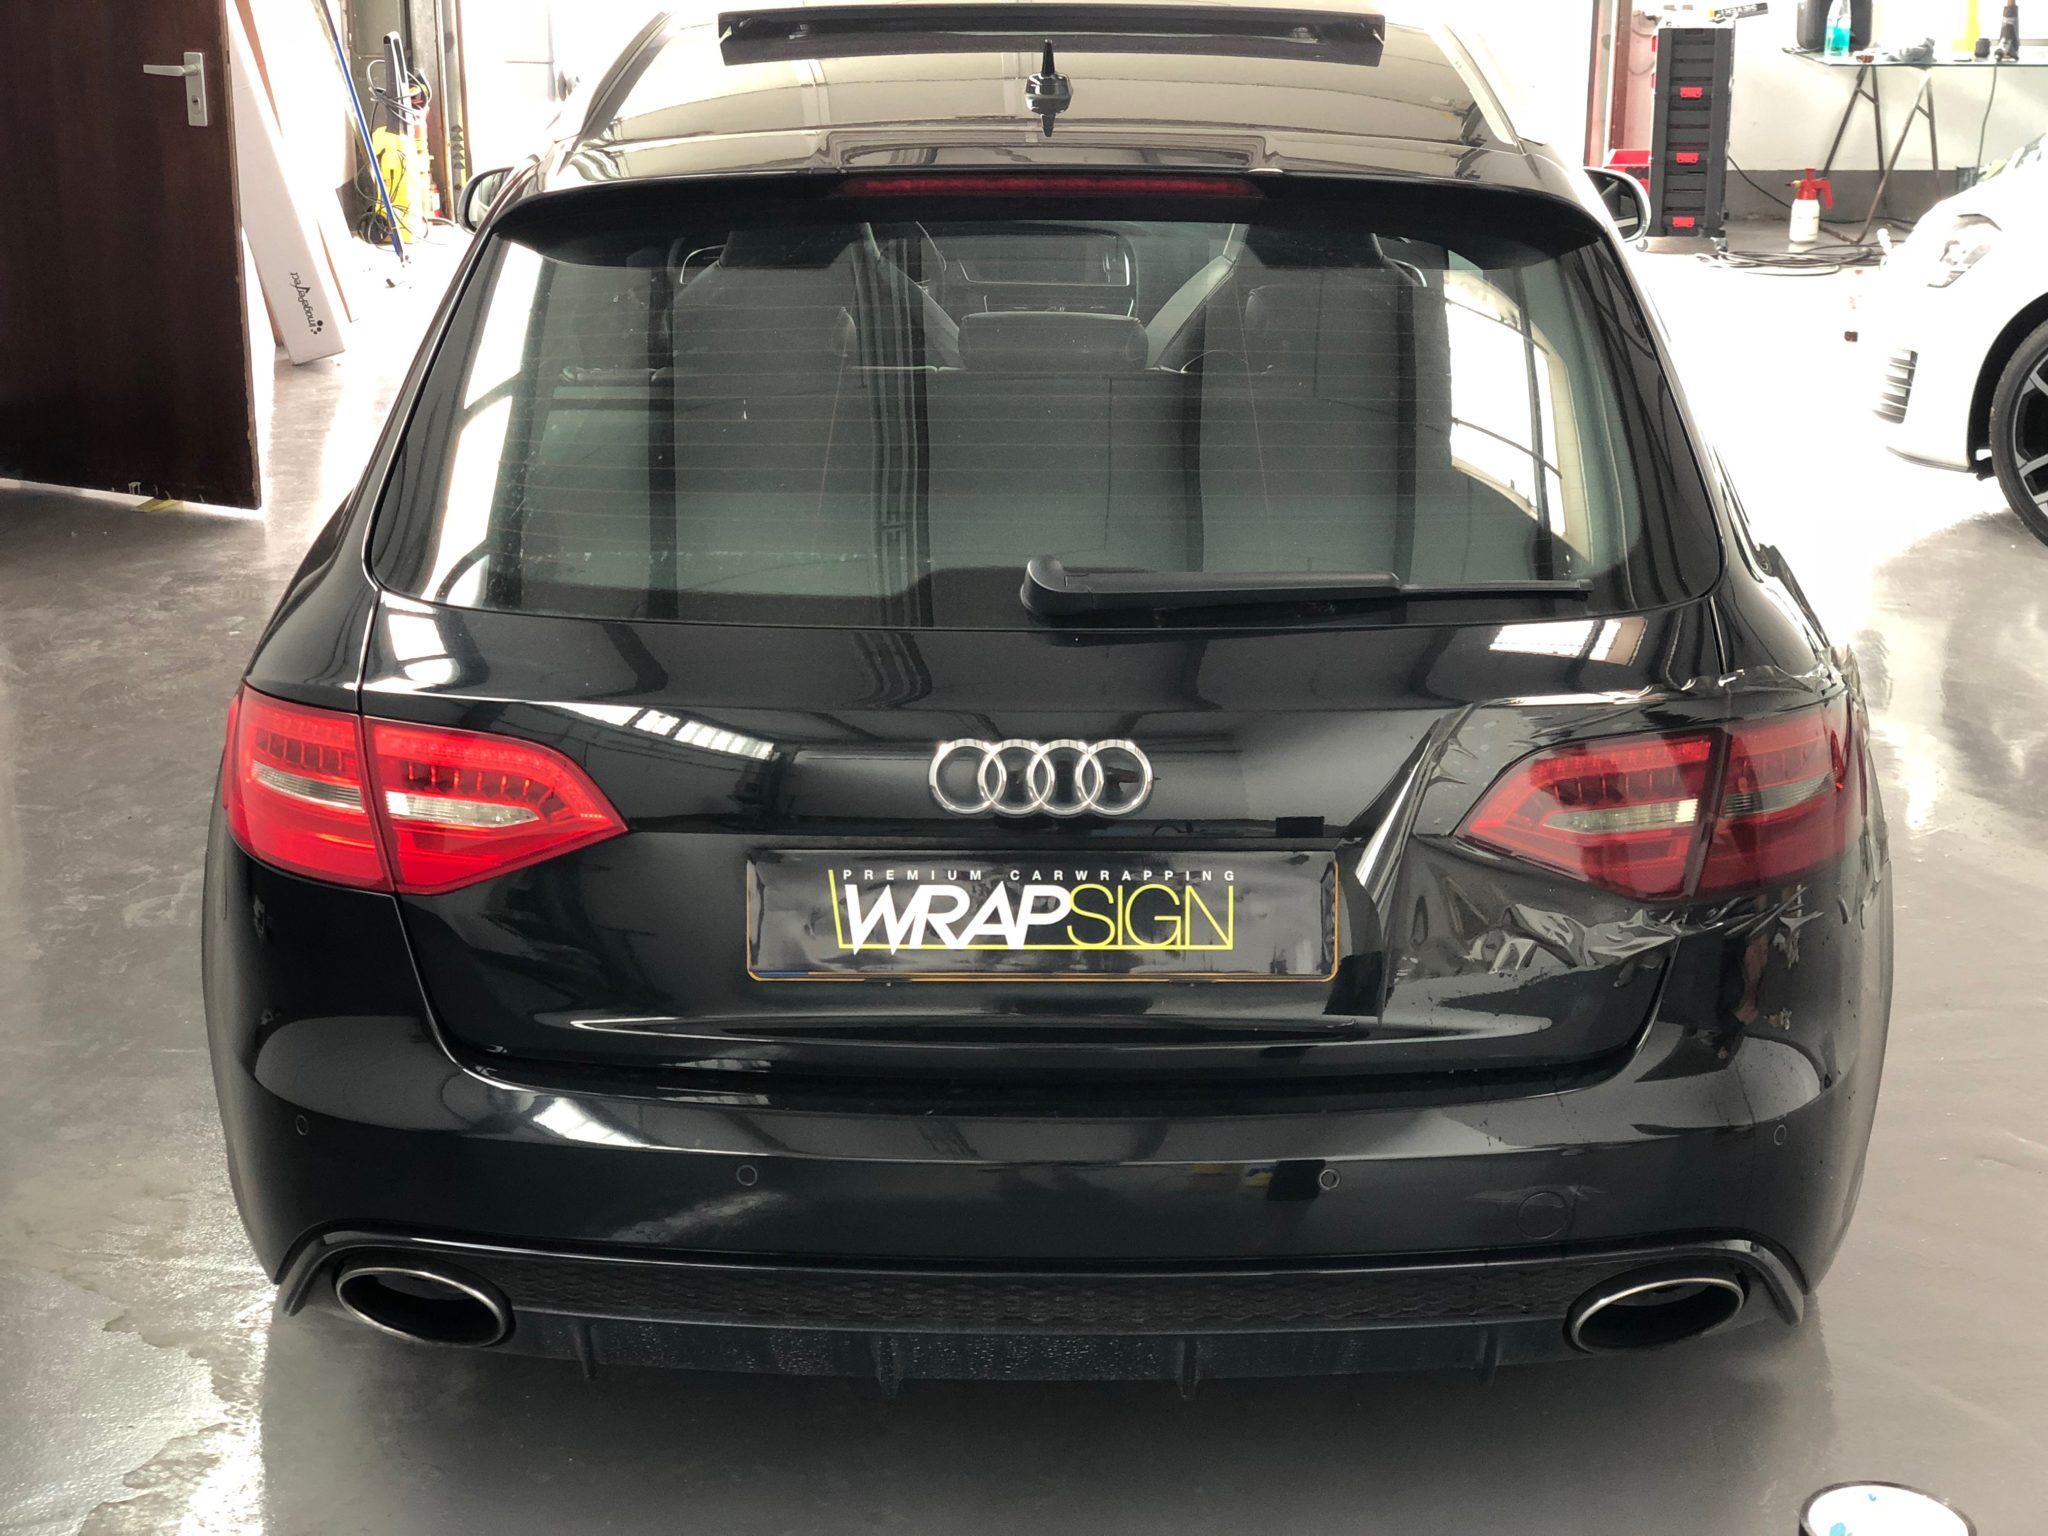 Rückleuchtentönung bei einem Audi A4